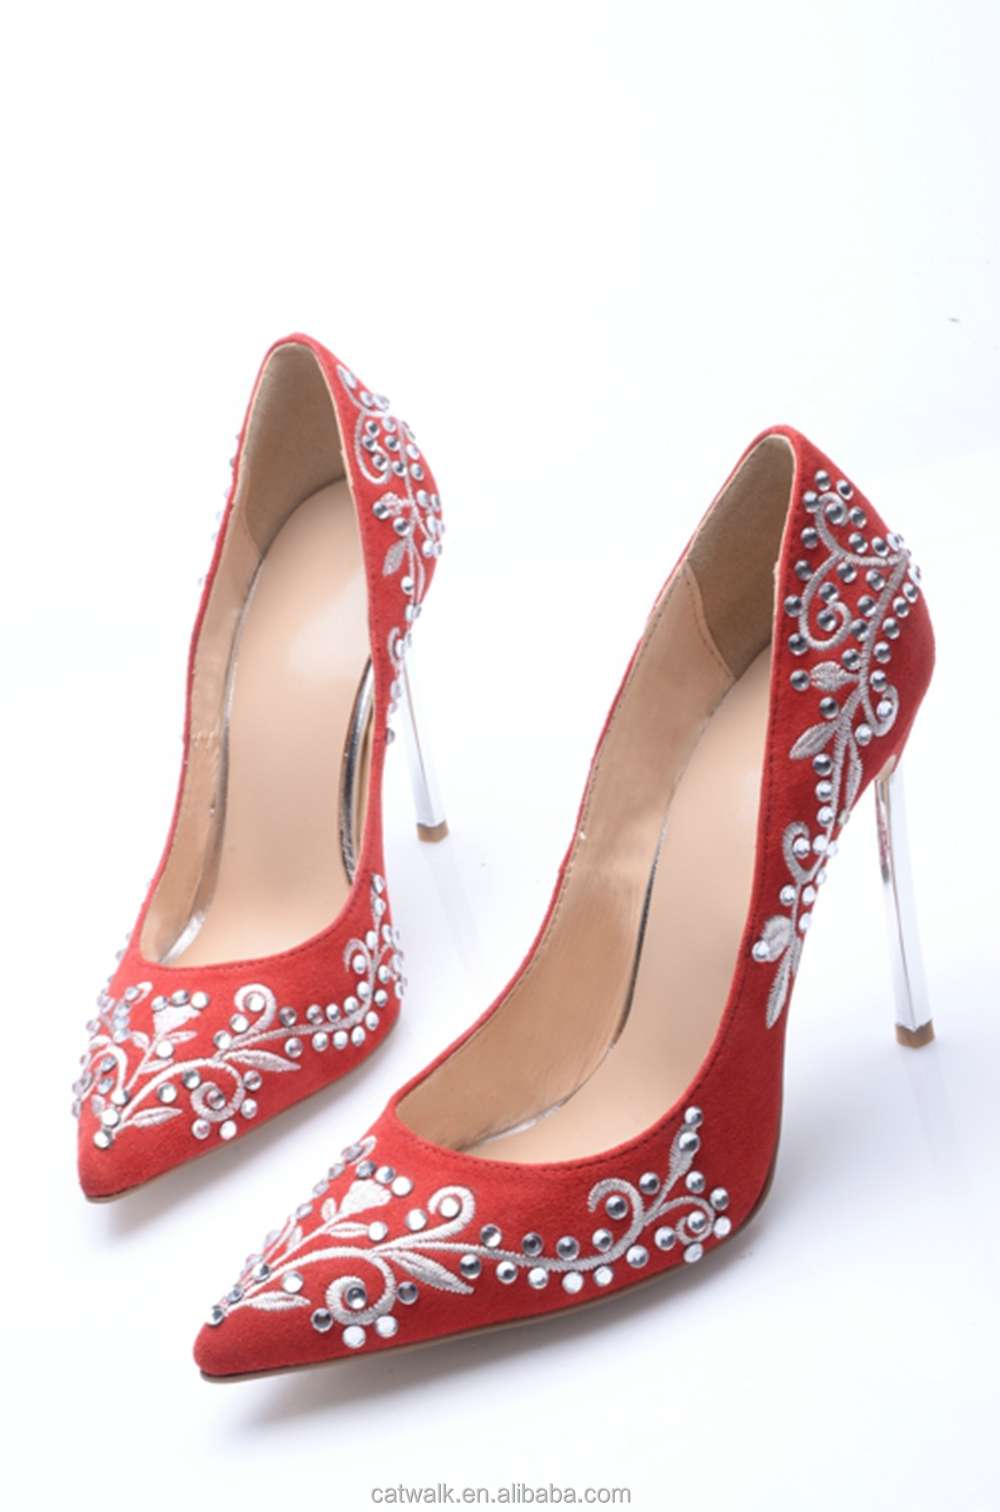 designer red wedding shoes - photo #17